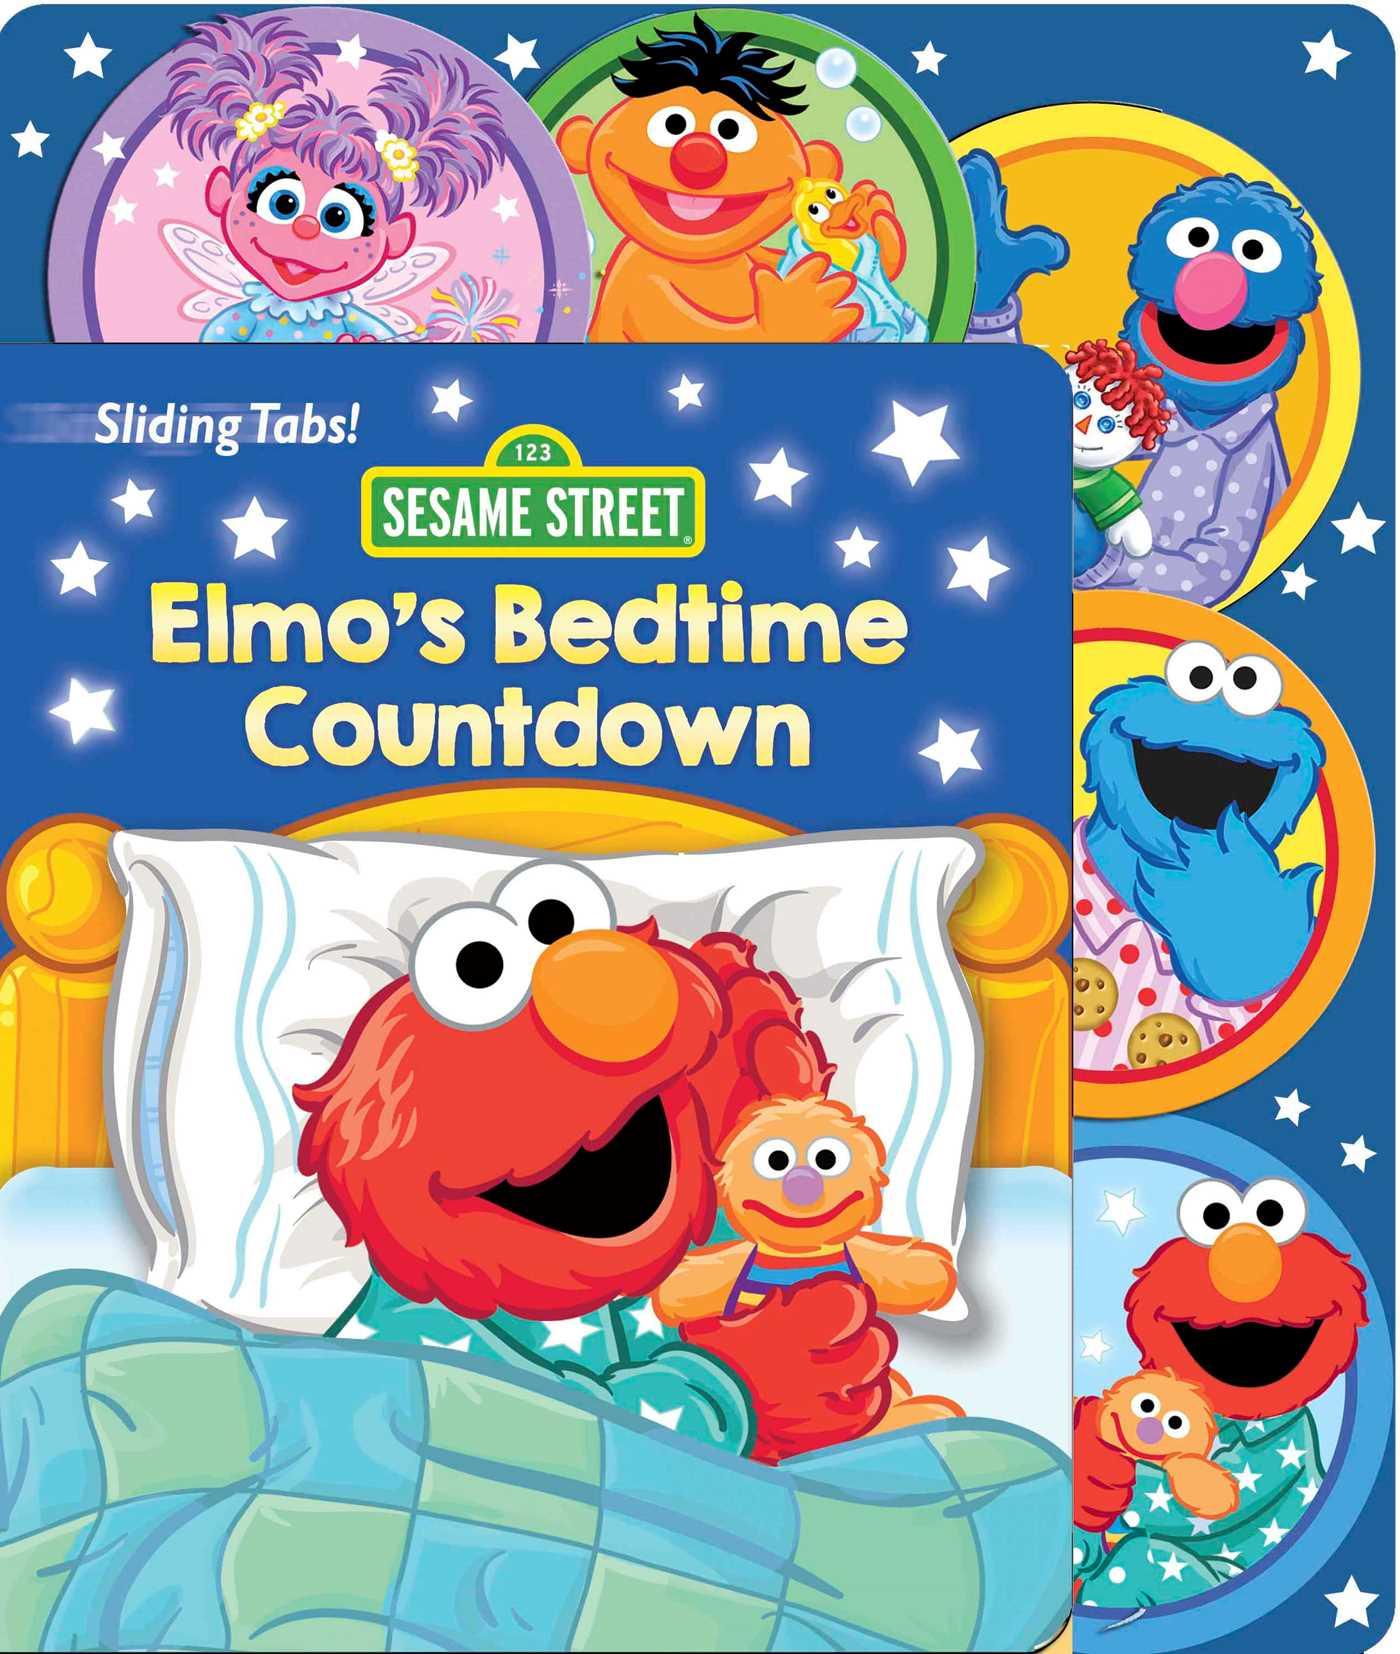 Elmos Christmas Countdown.Sesame Street Elmo S Bedtime Countdown Book By Lori C